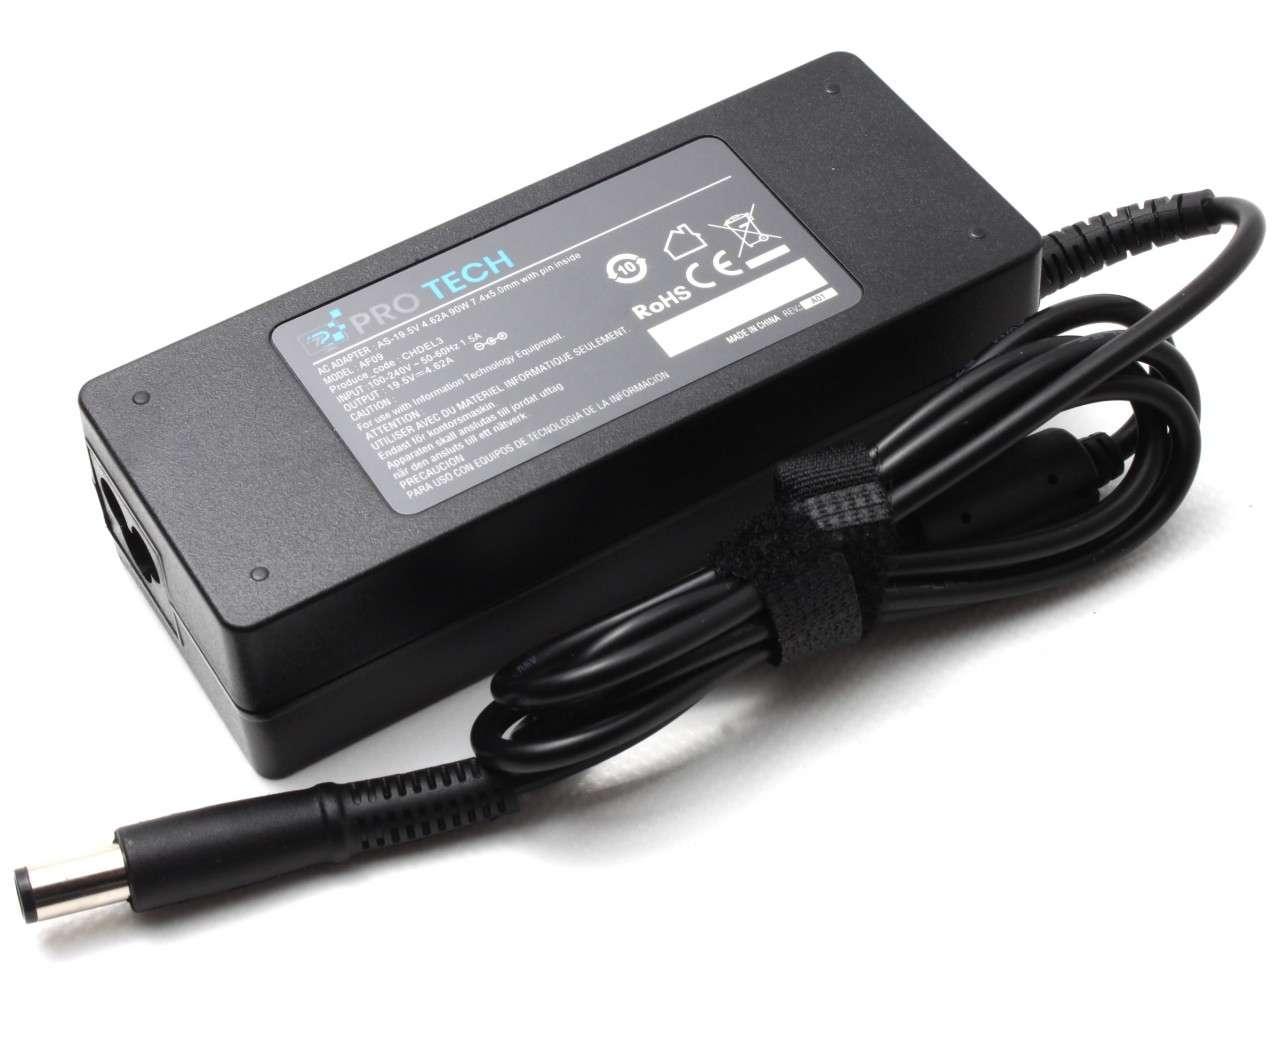 Incarcator Dell Latitude E6530 Replacement imagine powerlaptop.ro 2021